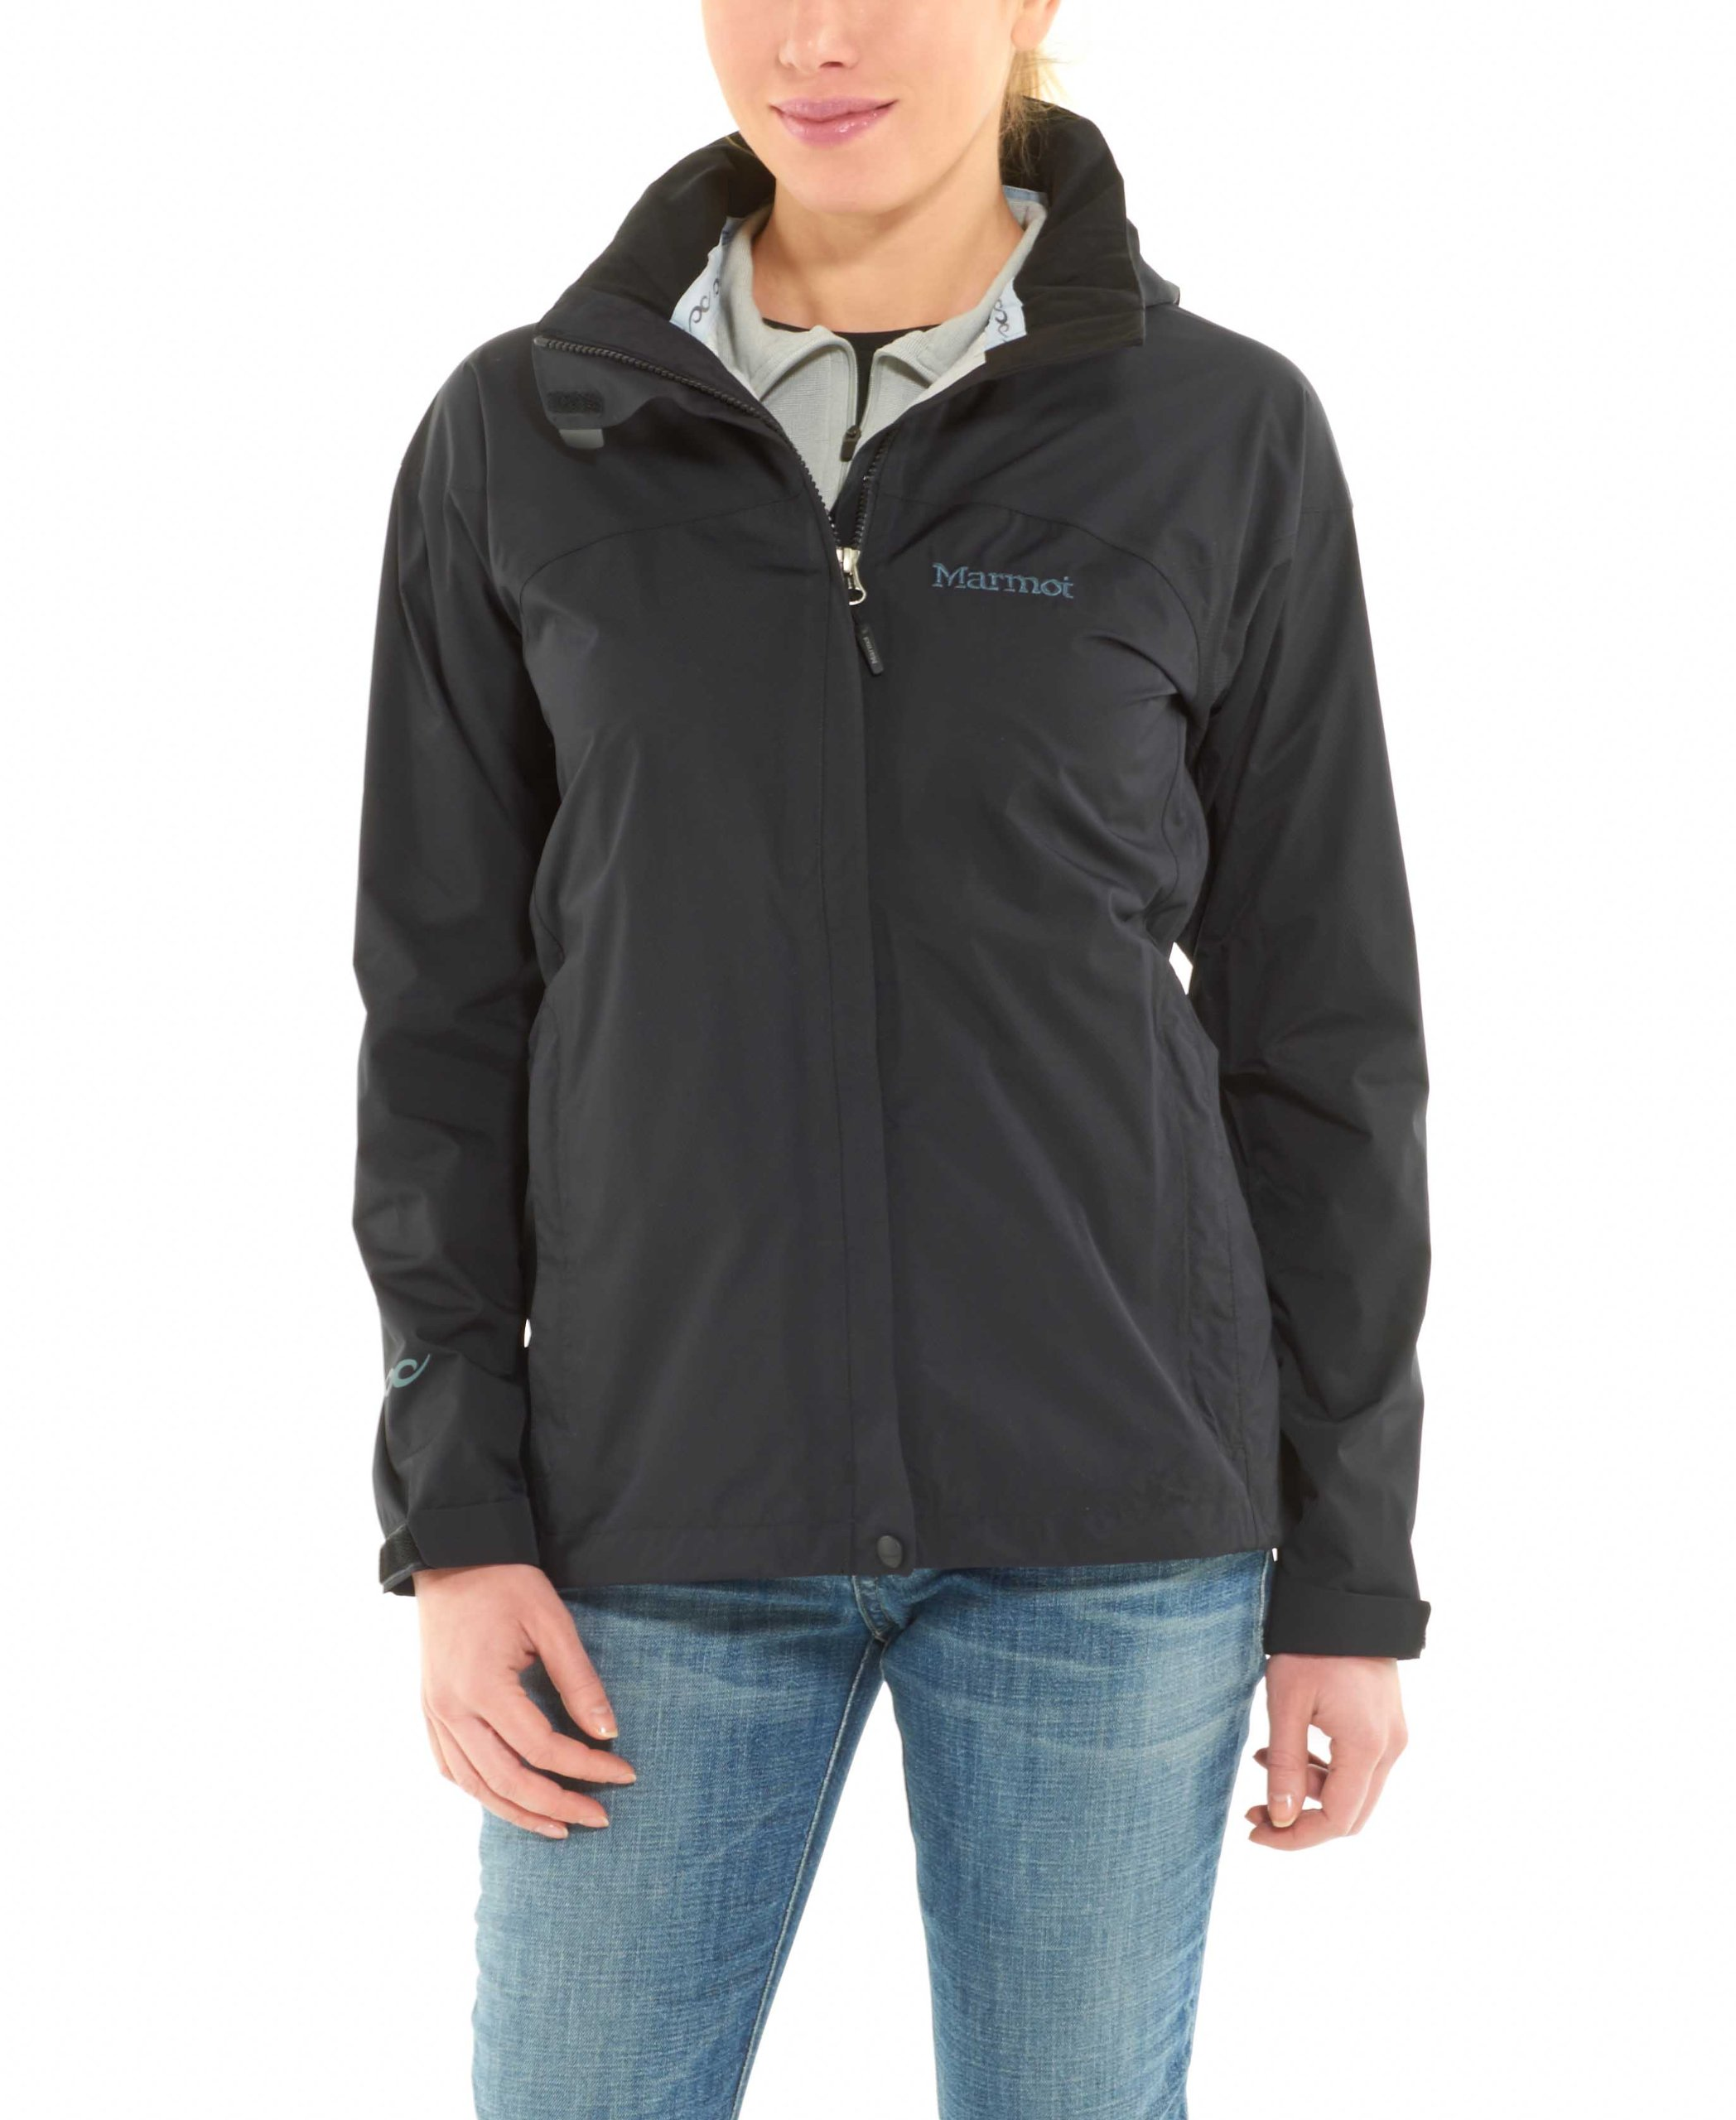 Marmot Phoenix Jacket Womens1261 Style: 1261-001 Size: M